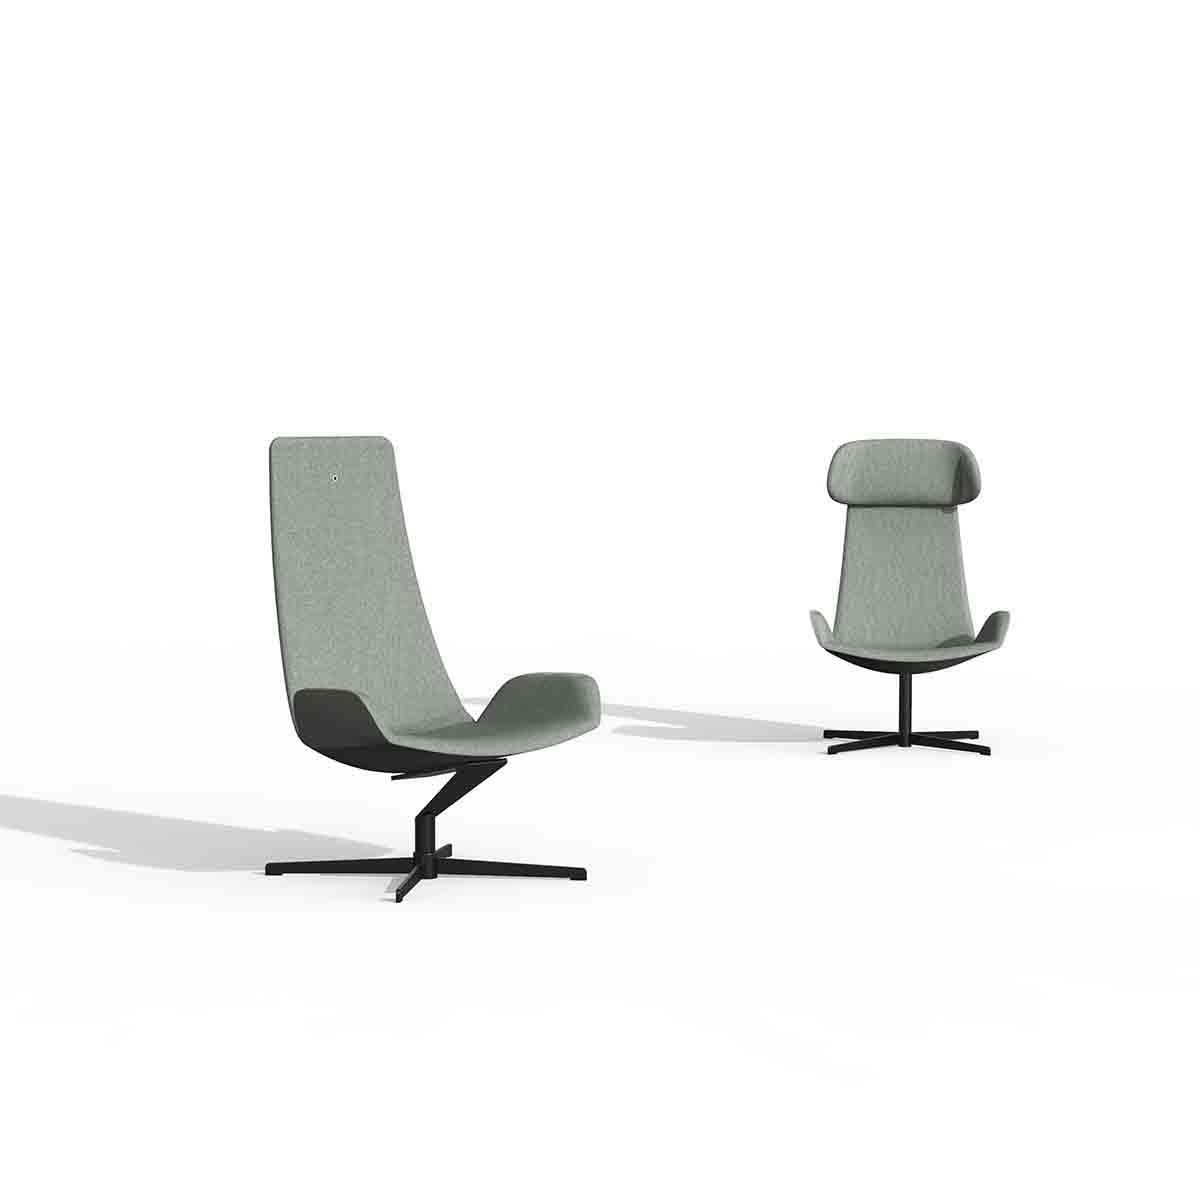 Kami卡米小国王椅_万博体育max登陆空间设计椅_玛拉蒂高端椅